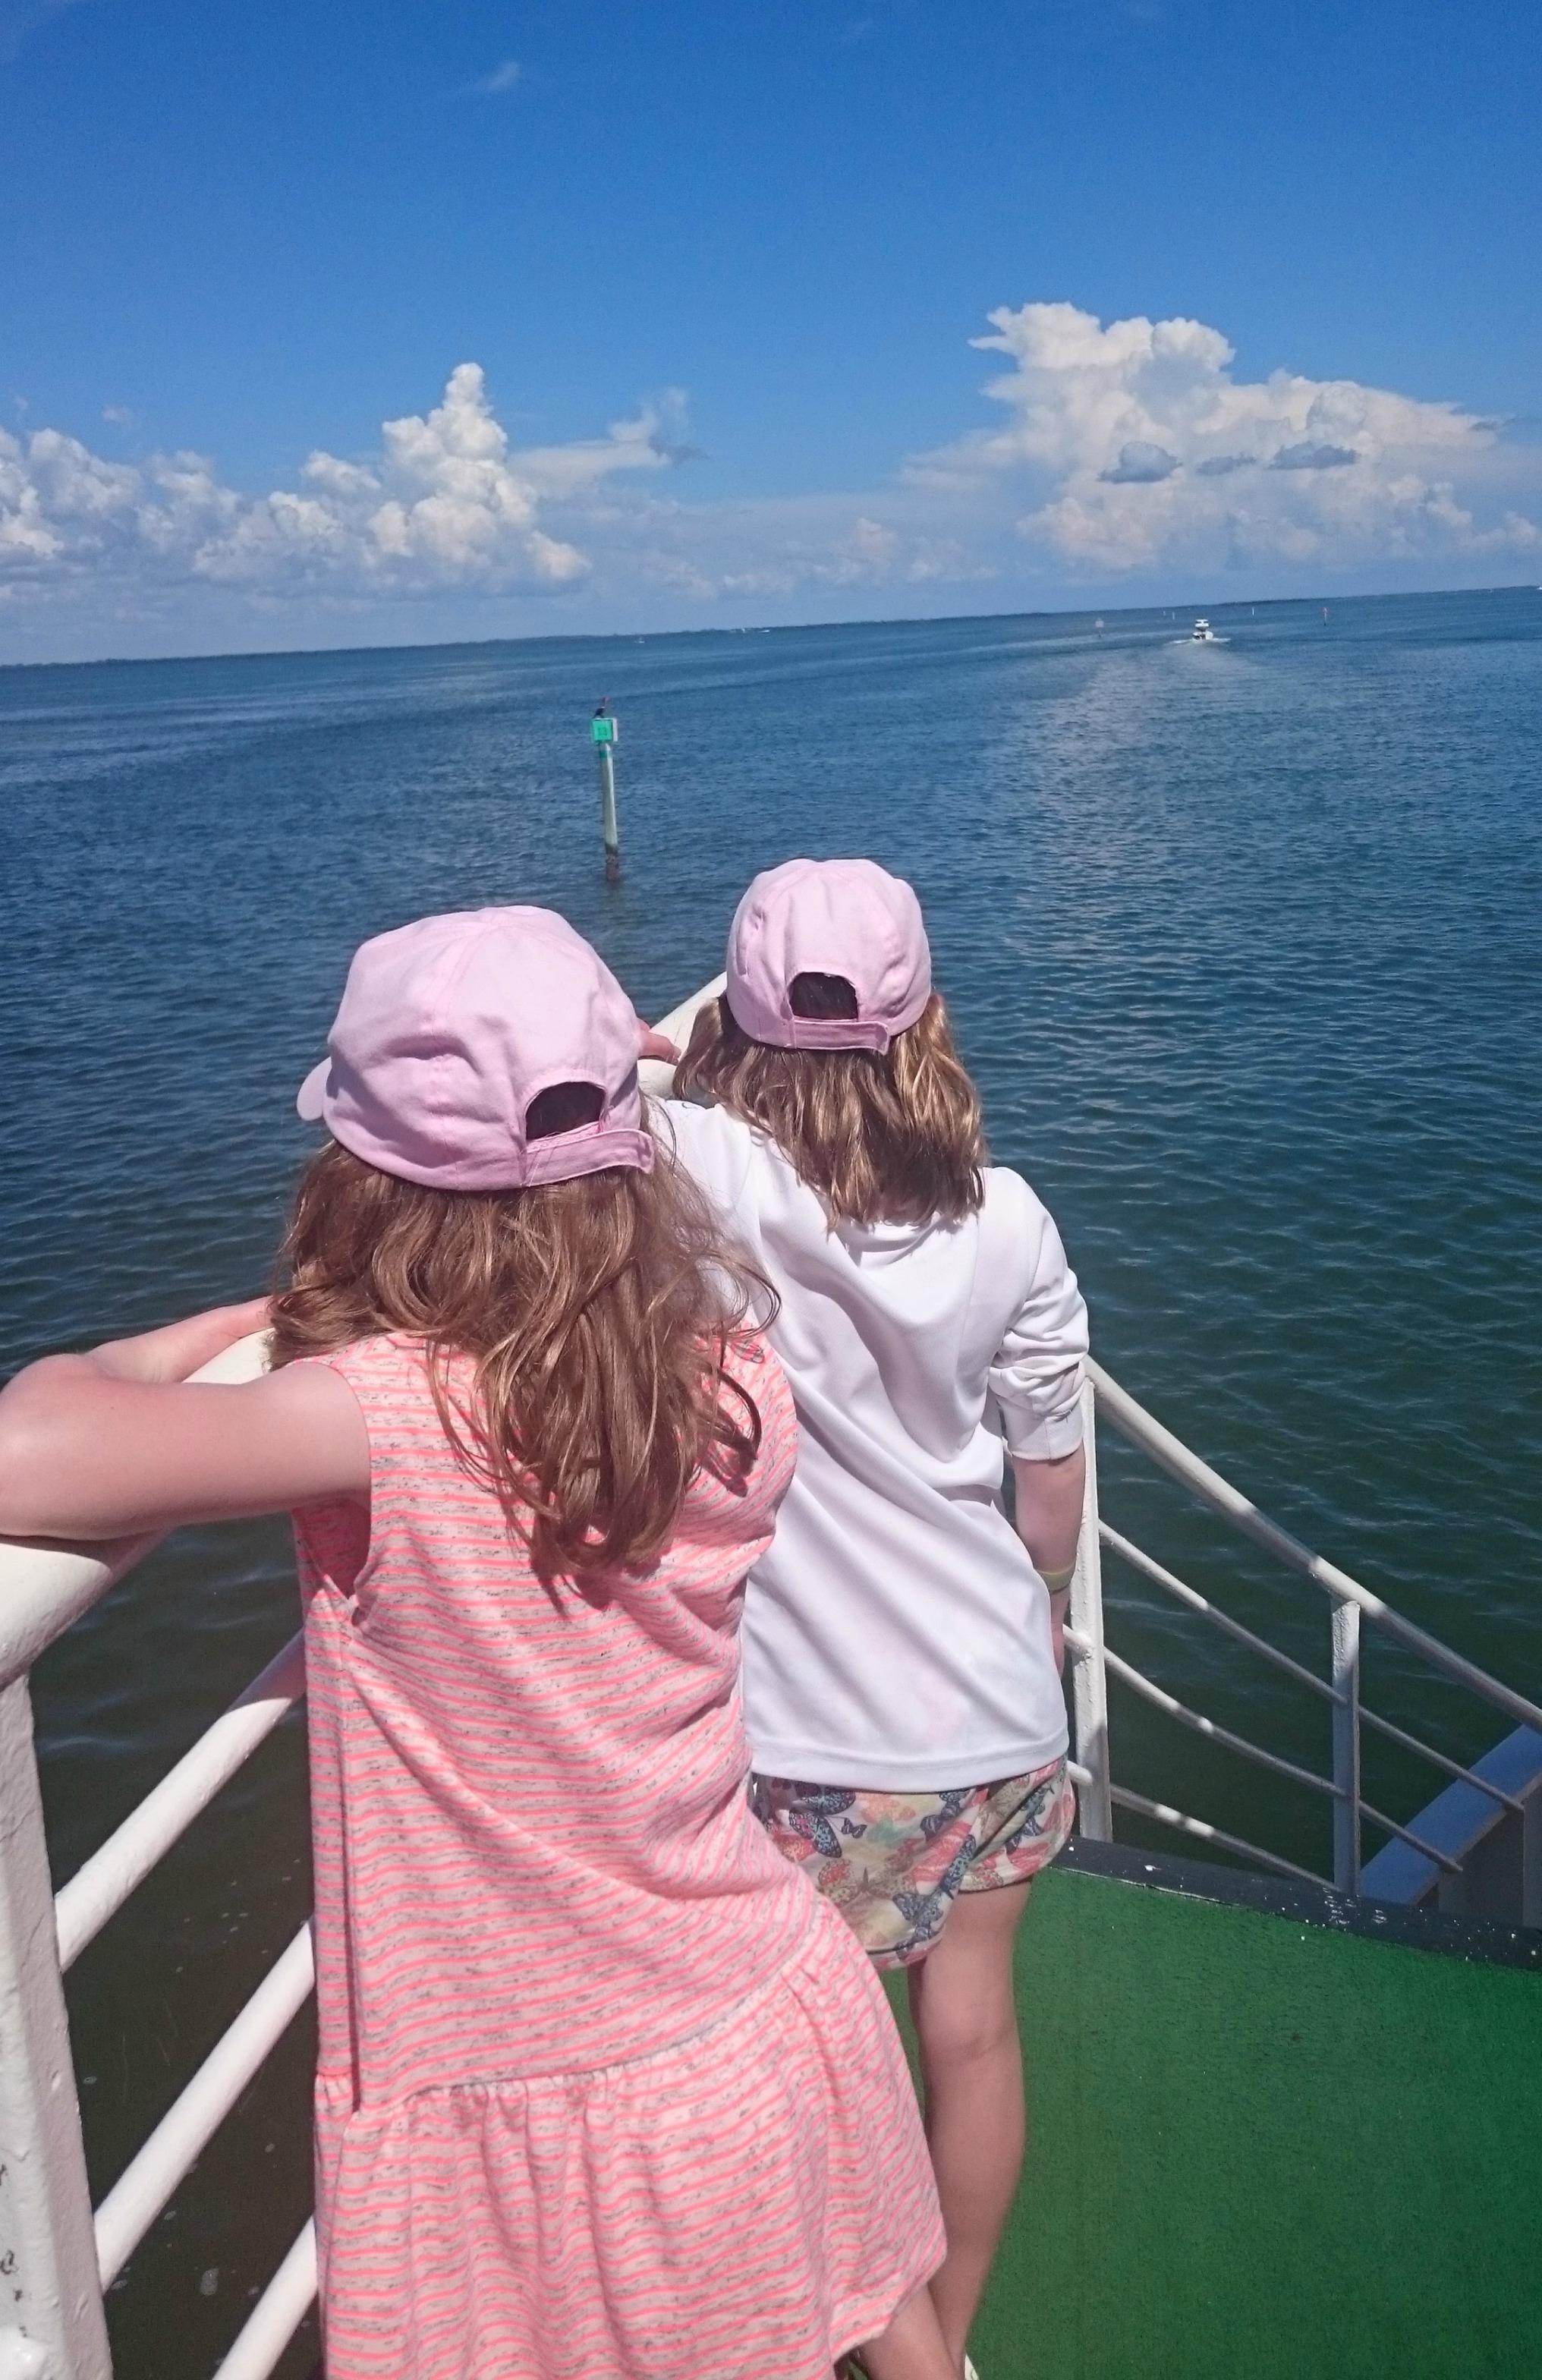 Pine Island Sound boat trip, Captiva Island, Florida